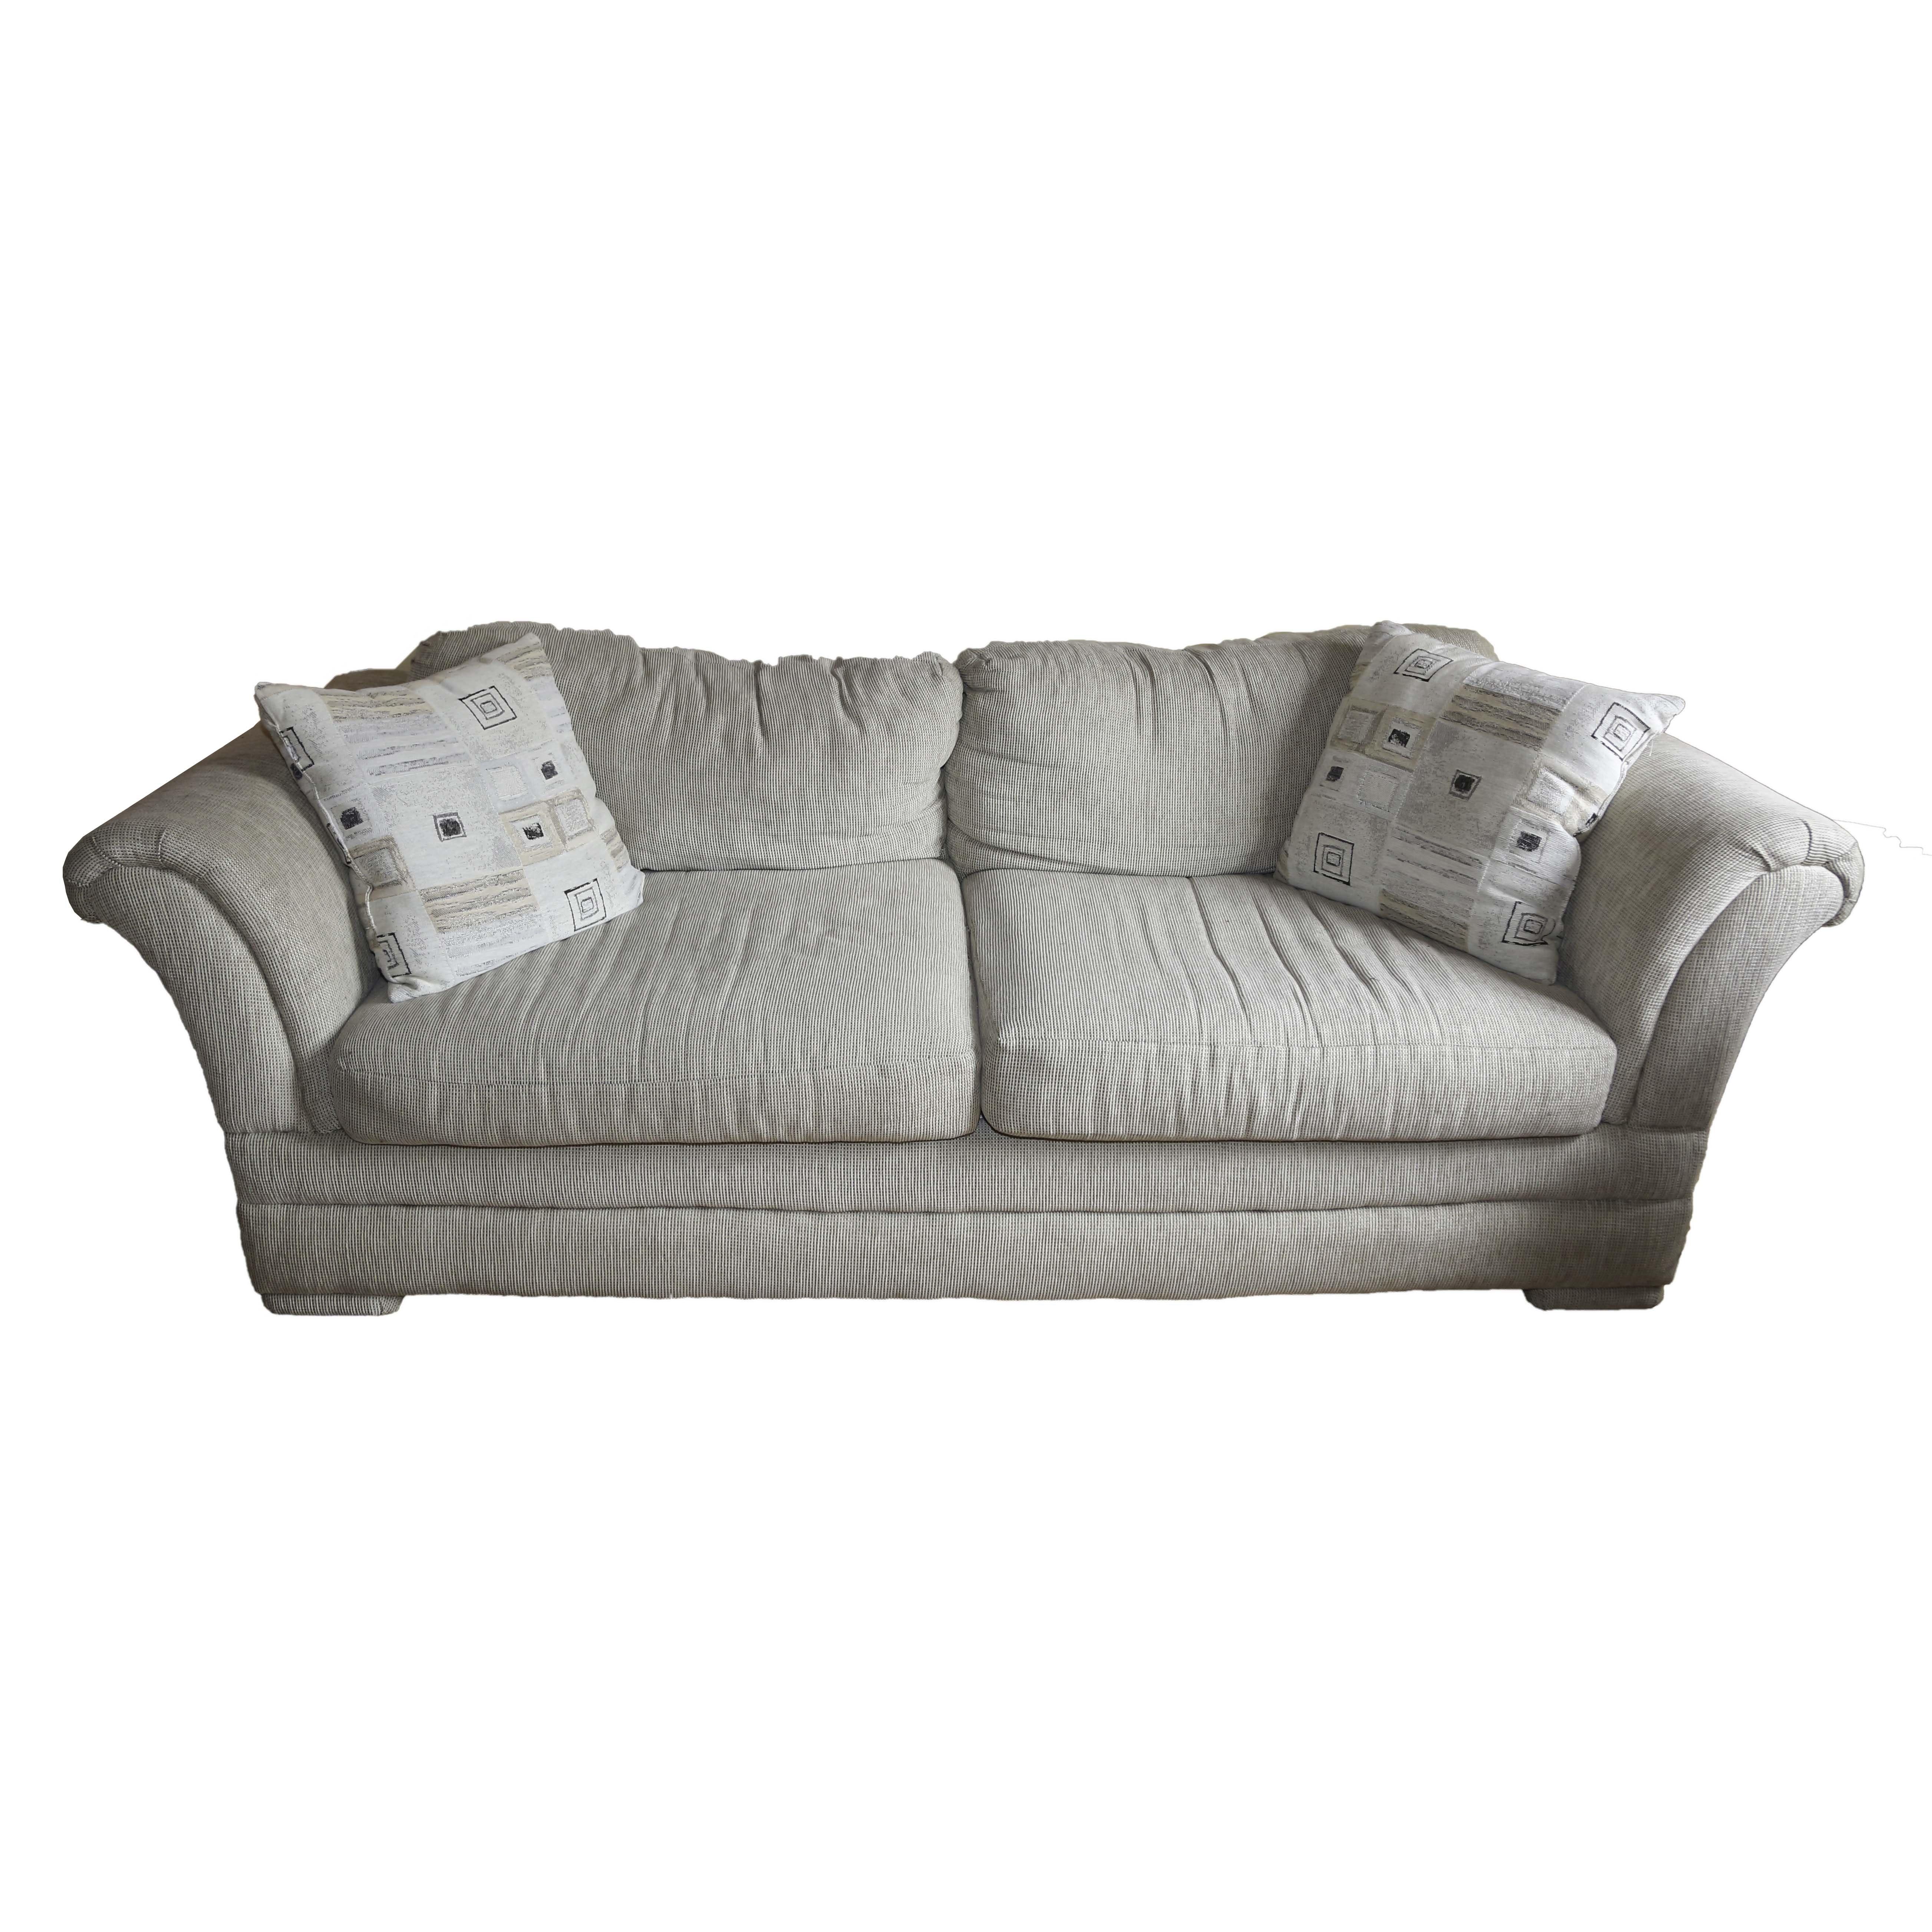 Upholstered Two Cushion Sofa